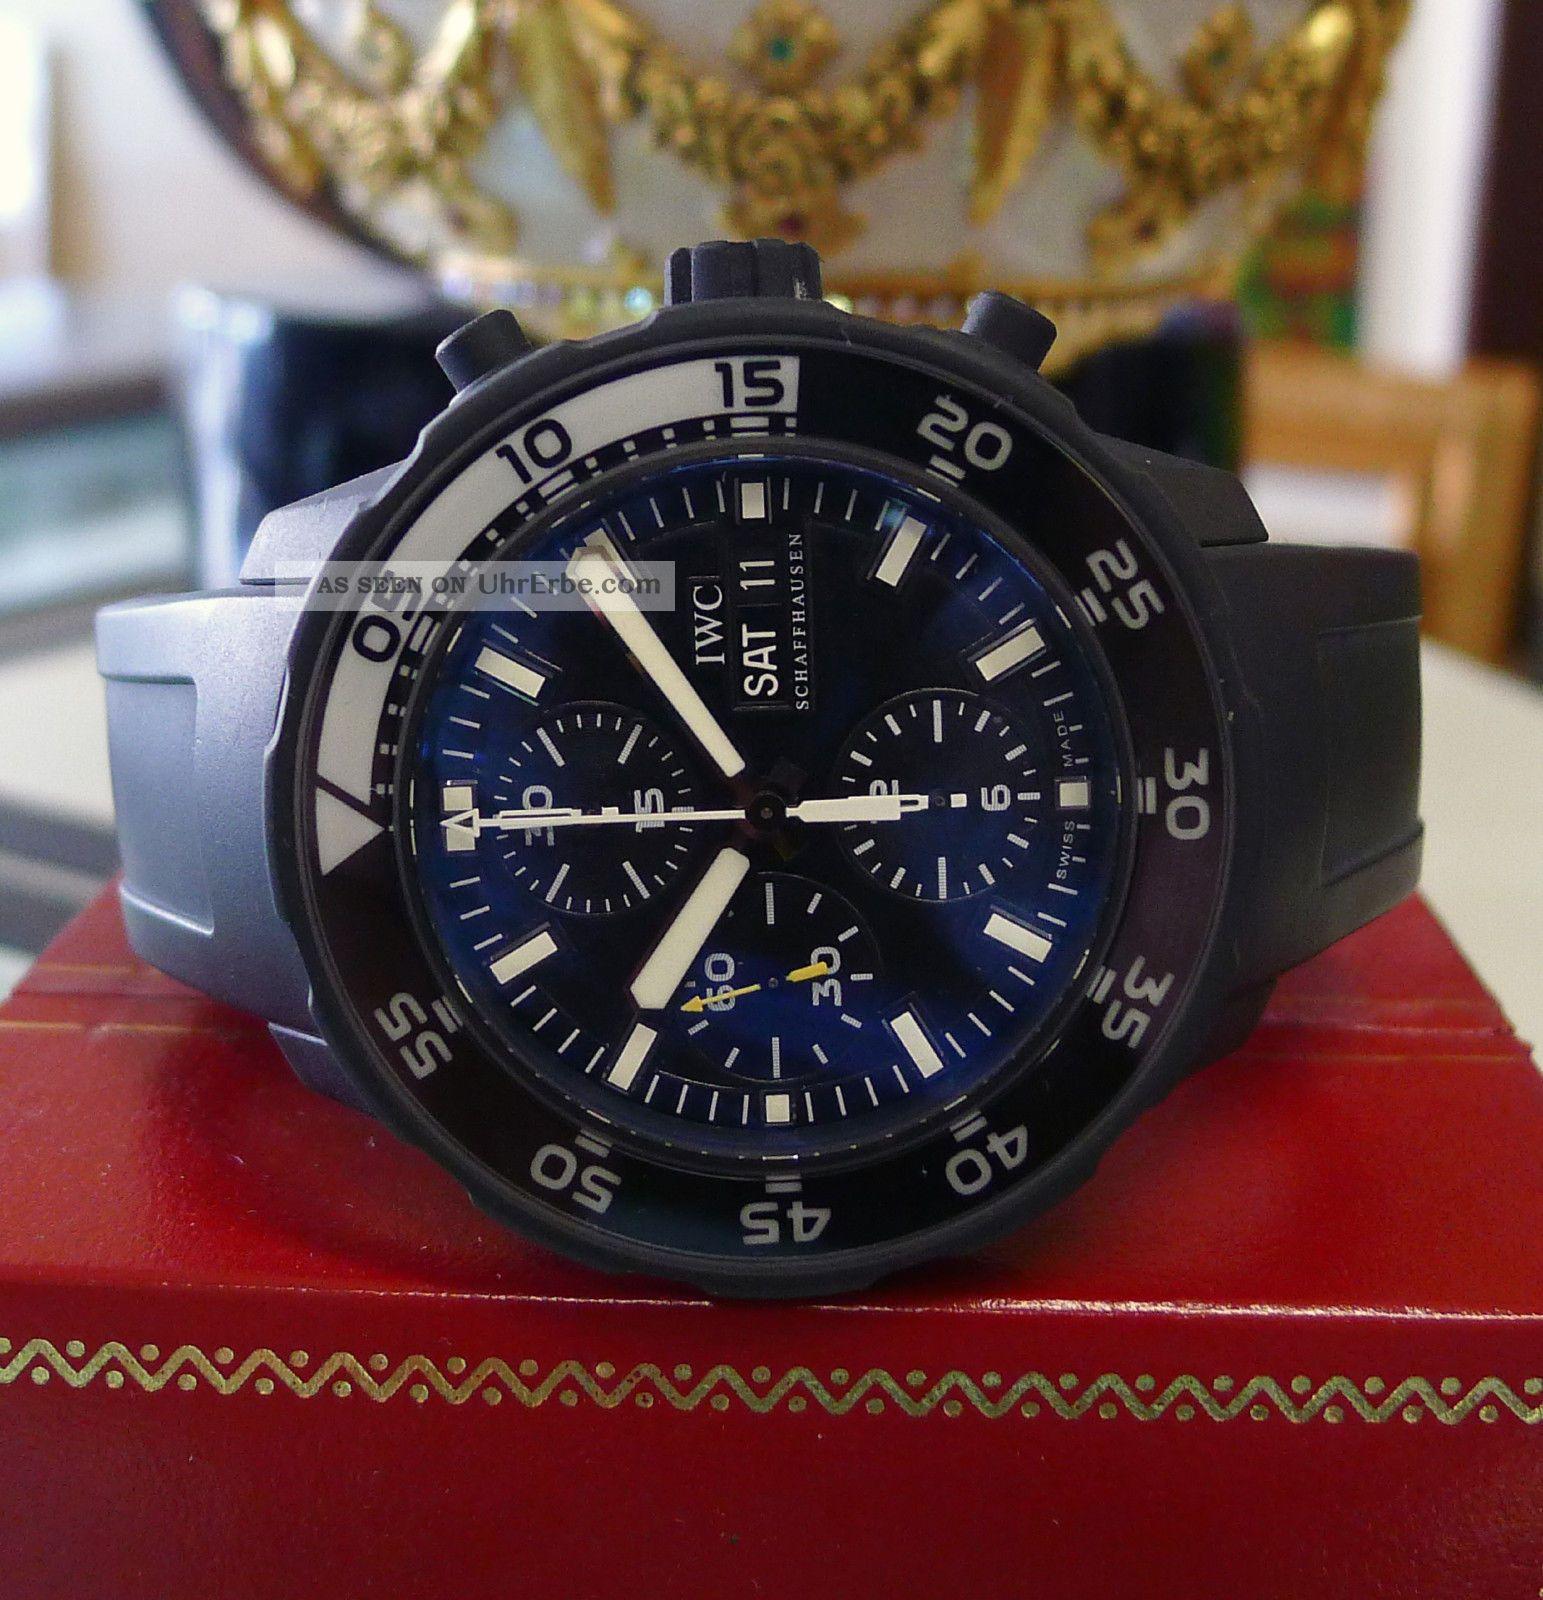 Herren Iwc Aquatimer Limitierte Ausgabe Galapagos Islands Chronograph Uhr Armbanduhren Bild